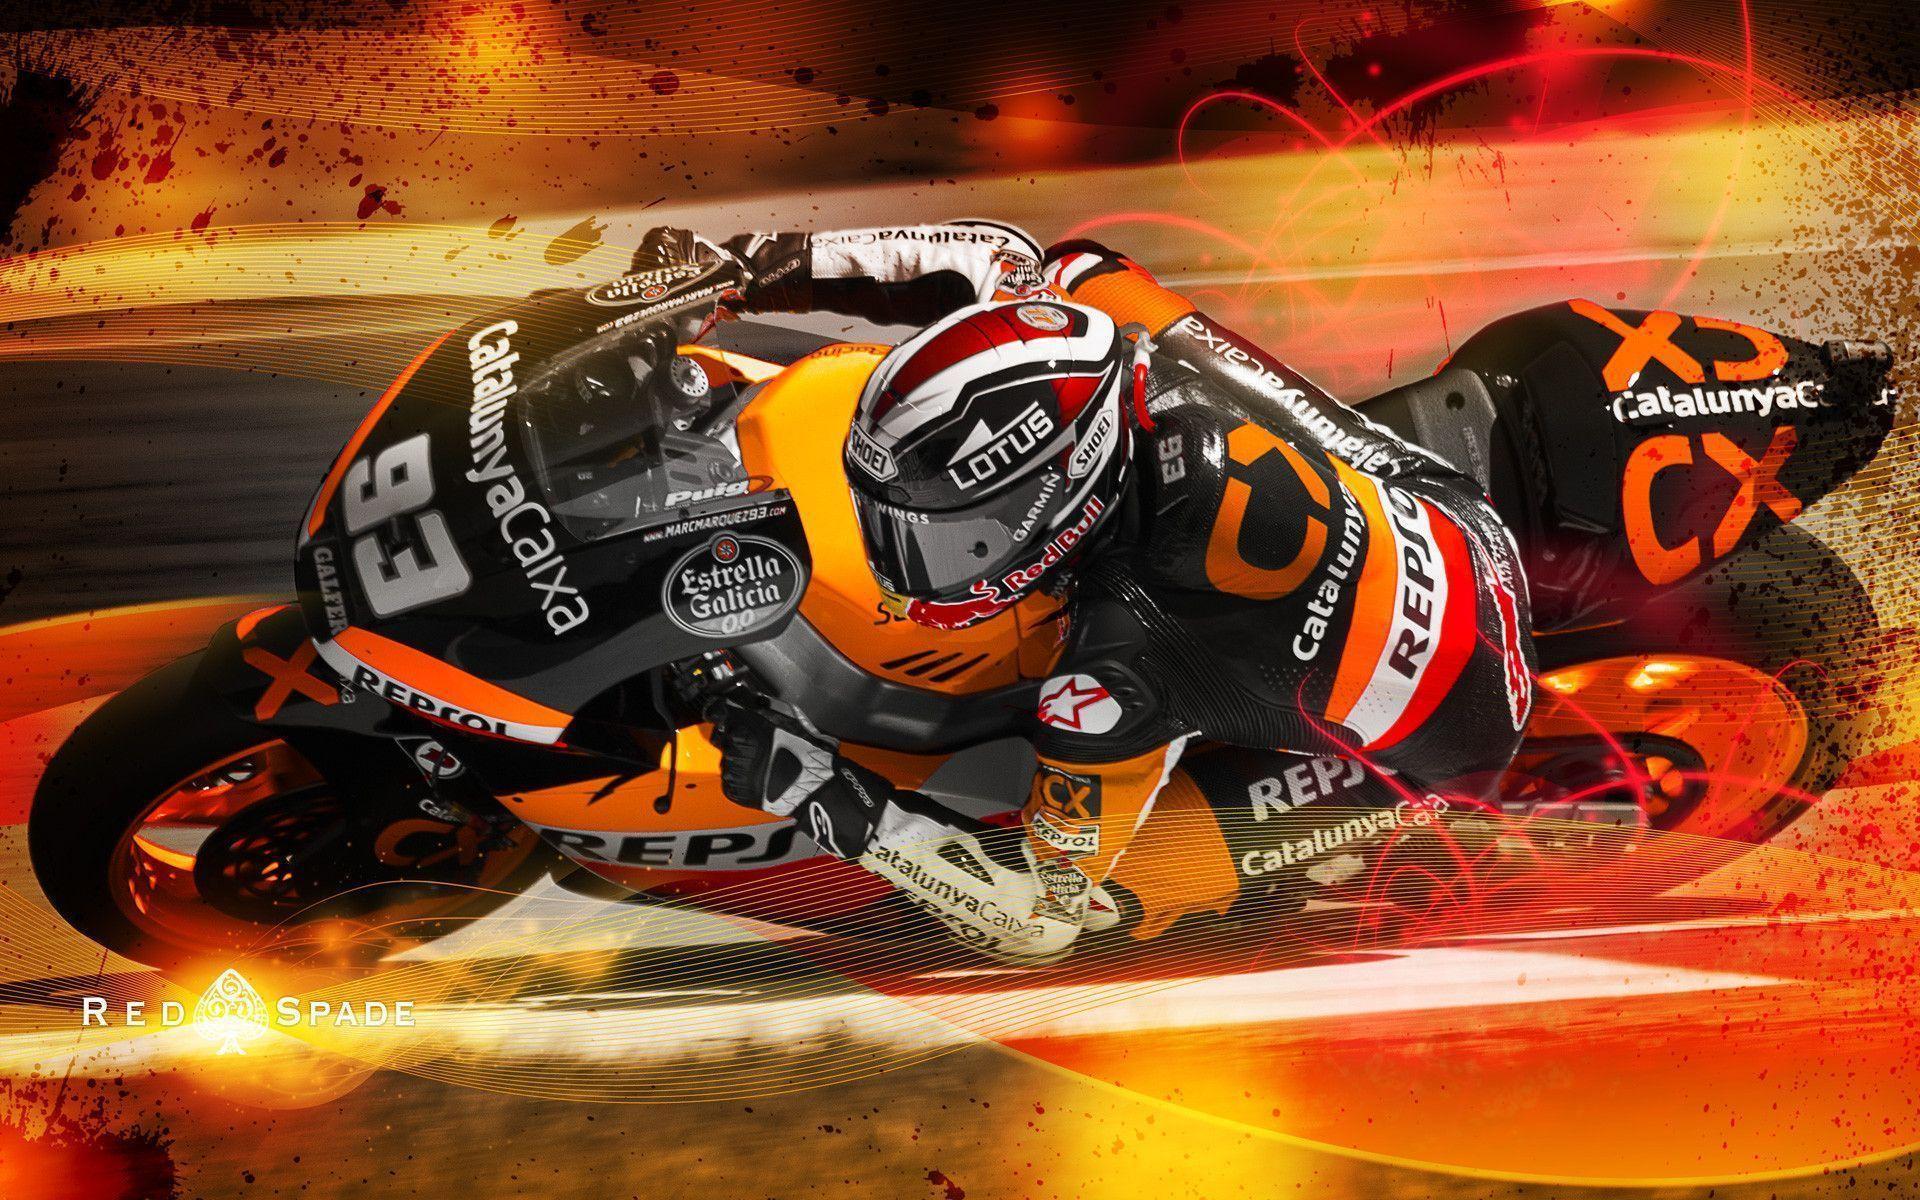 Moto GP Wallpapers - Wallpaper Cave